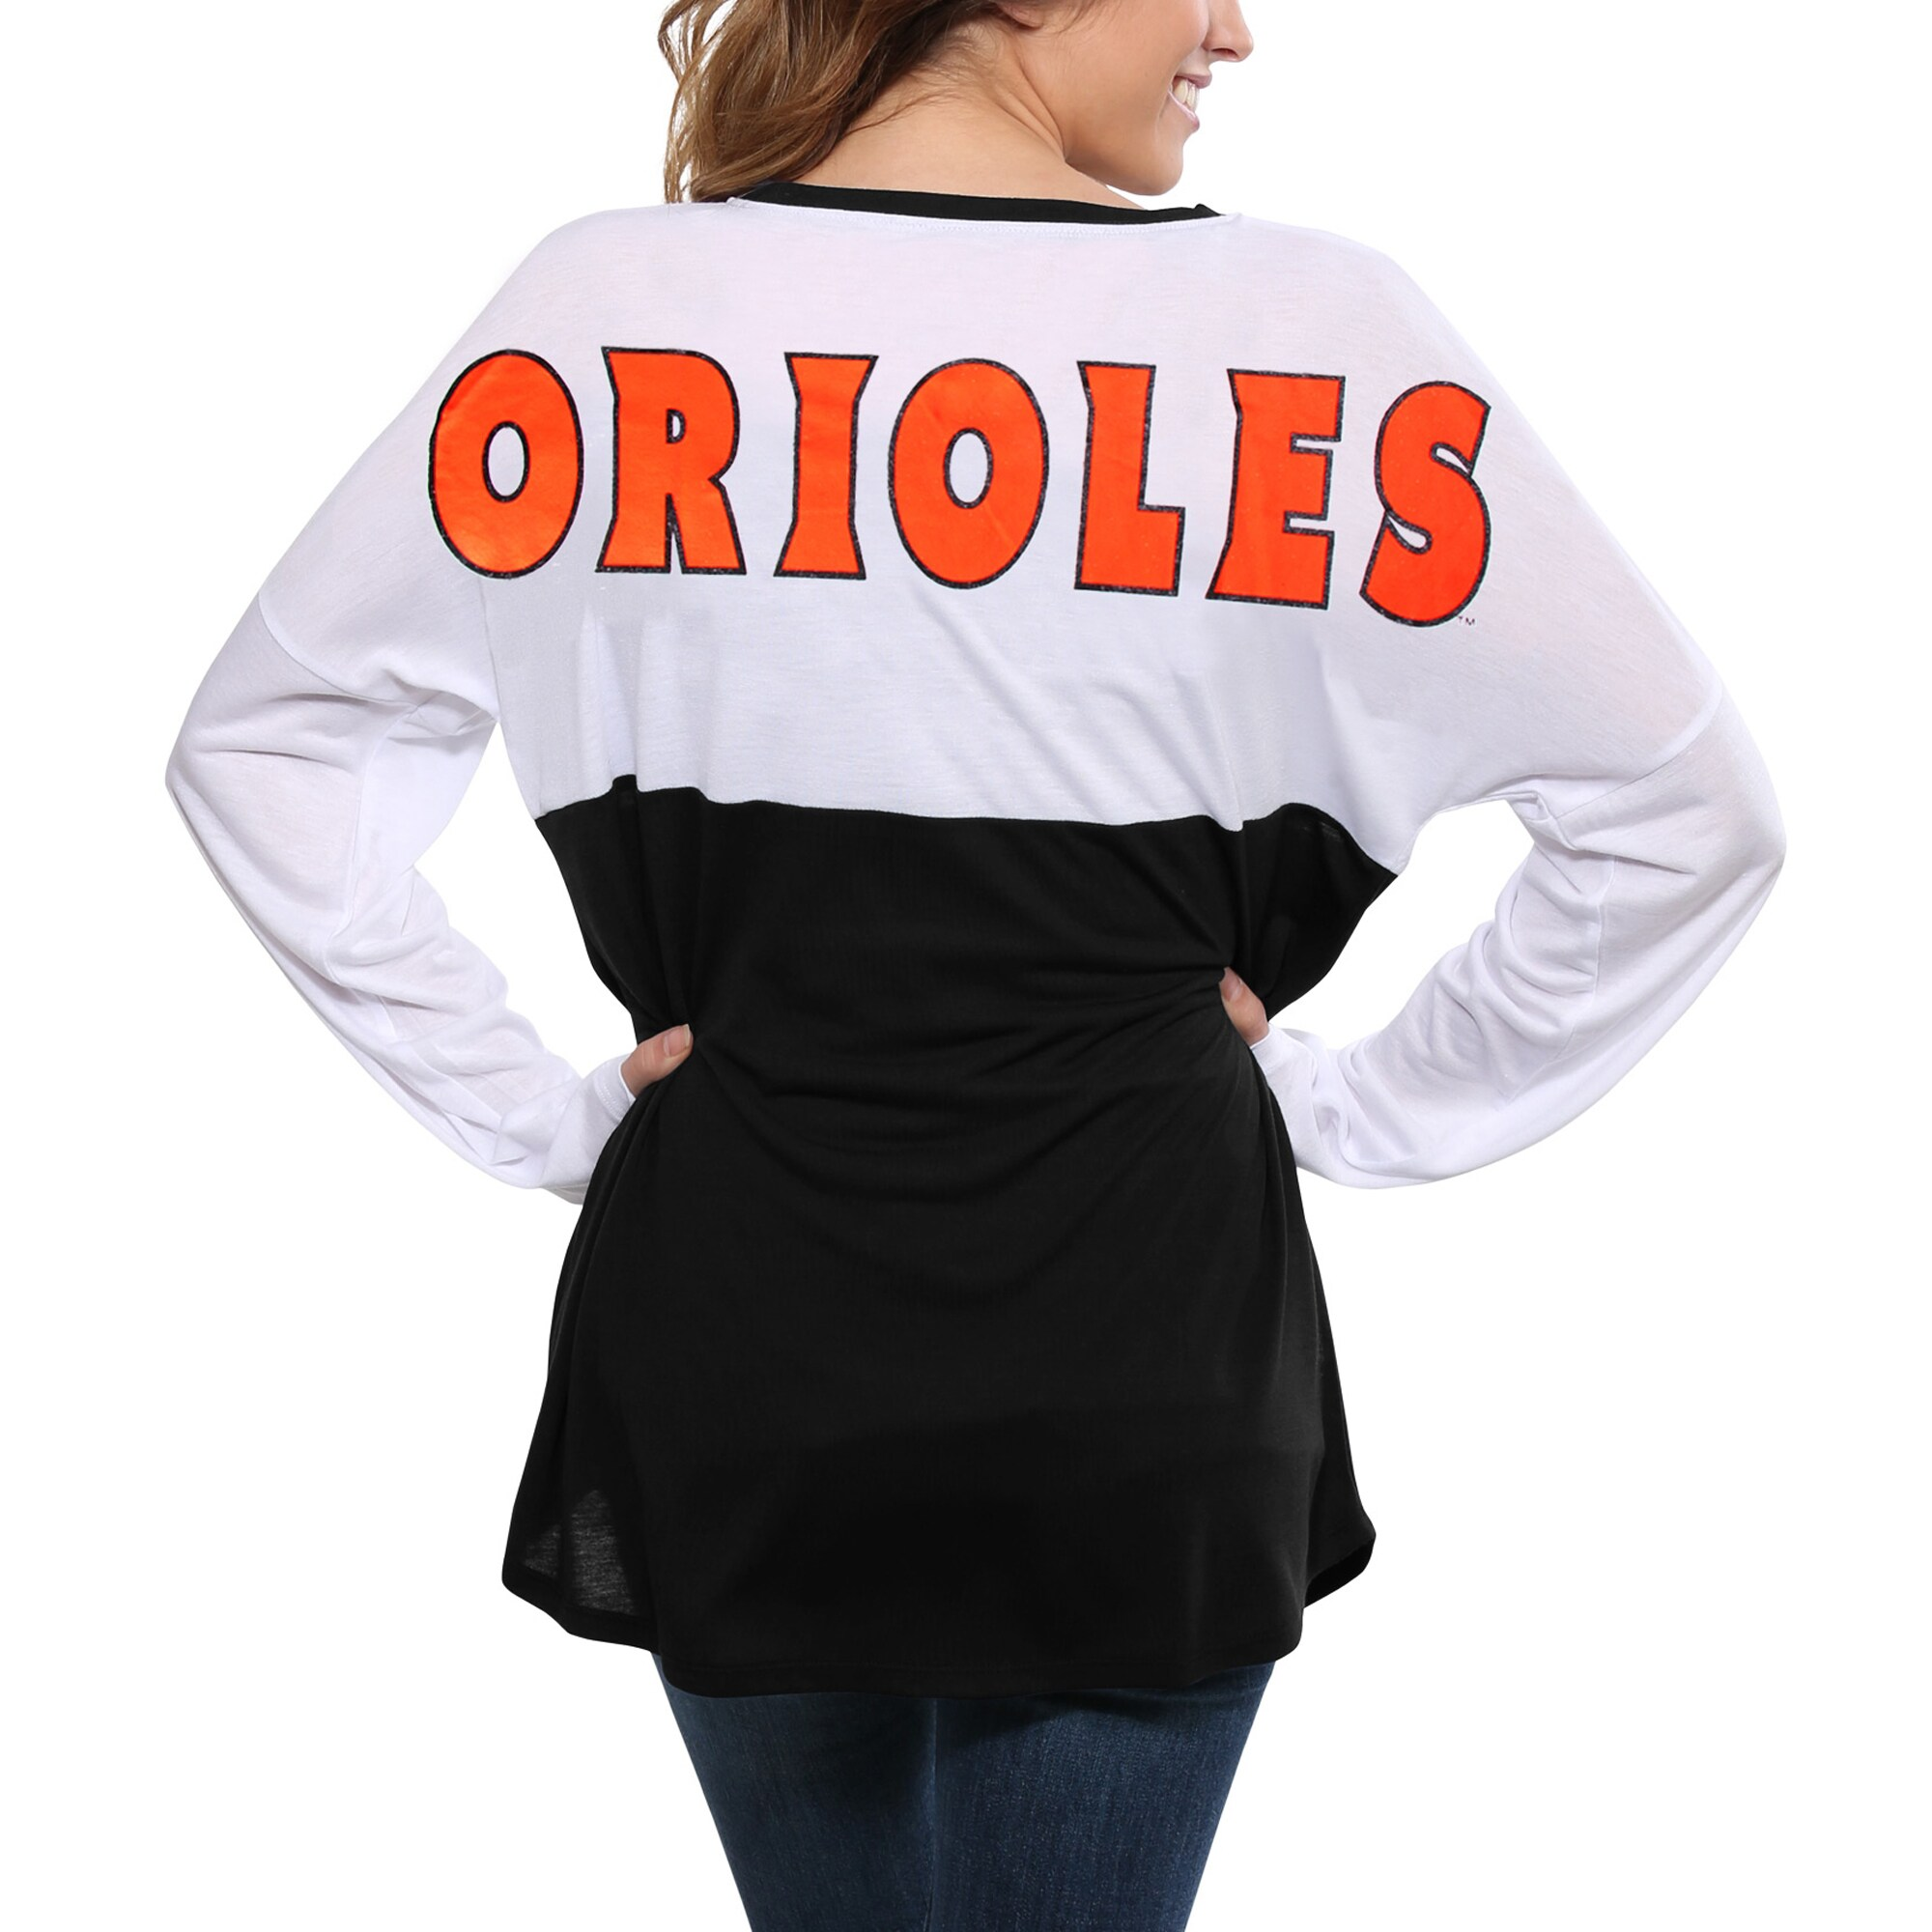 Baltimore Orioles Concepts Sport Women's Comeback Long Sleeve T-Shirt - White/Black